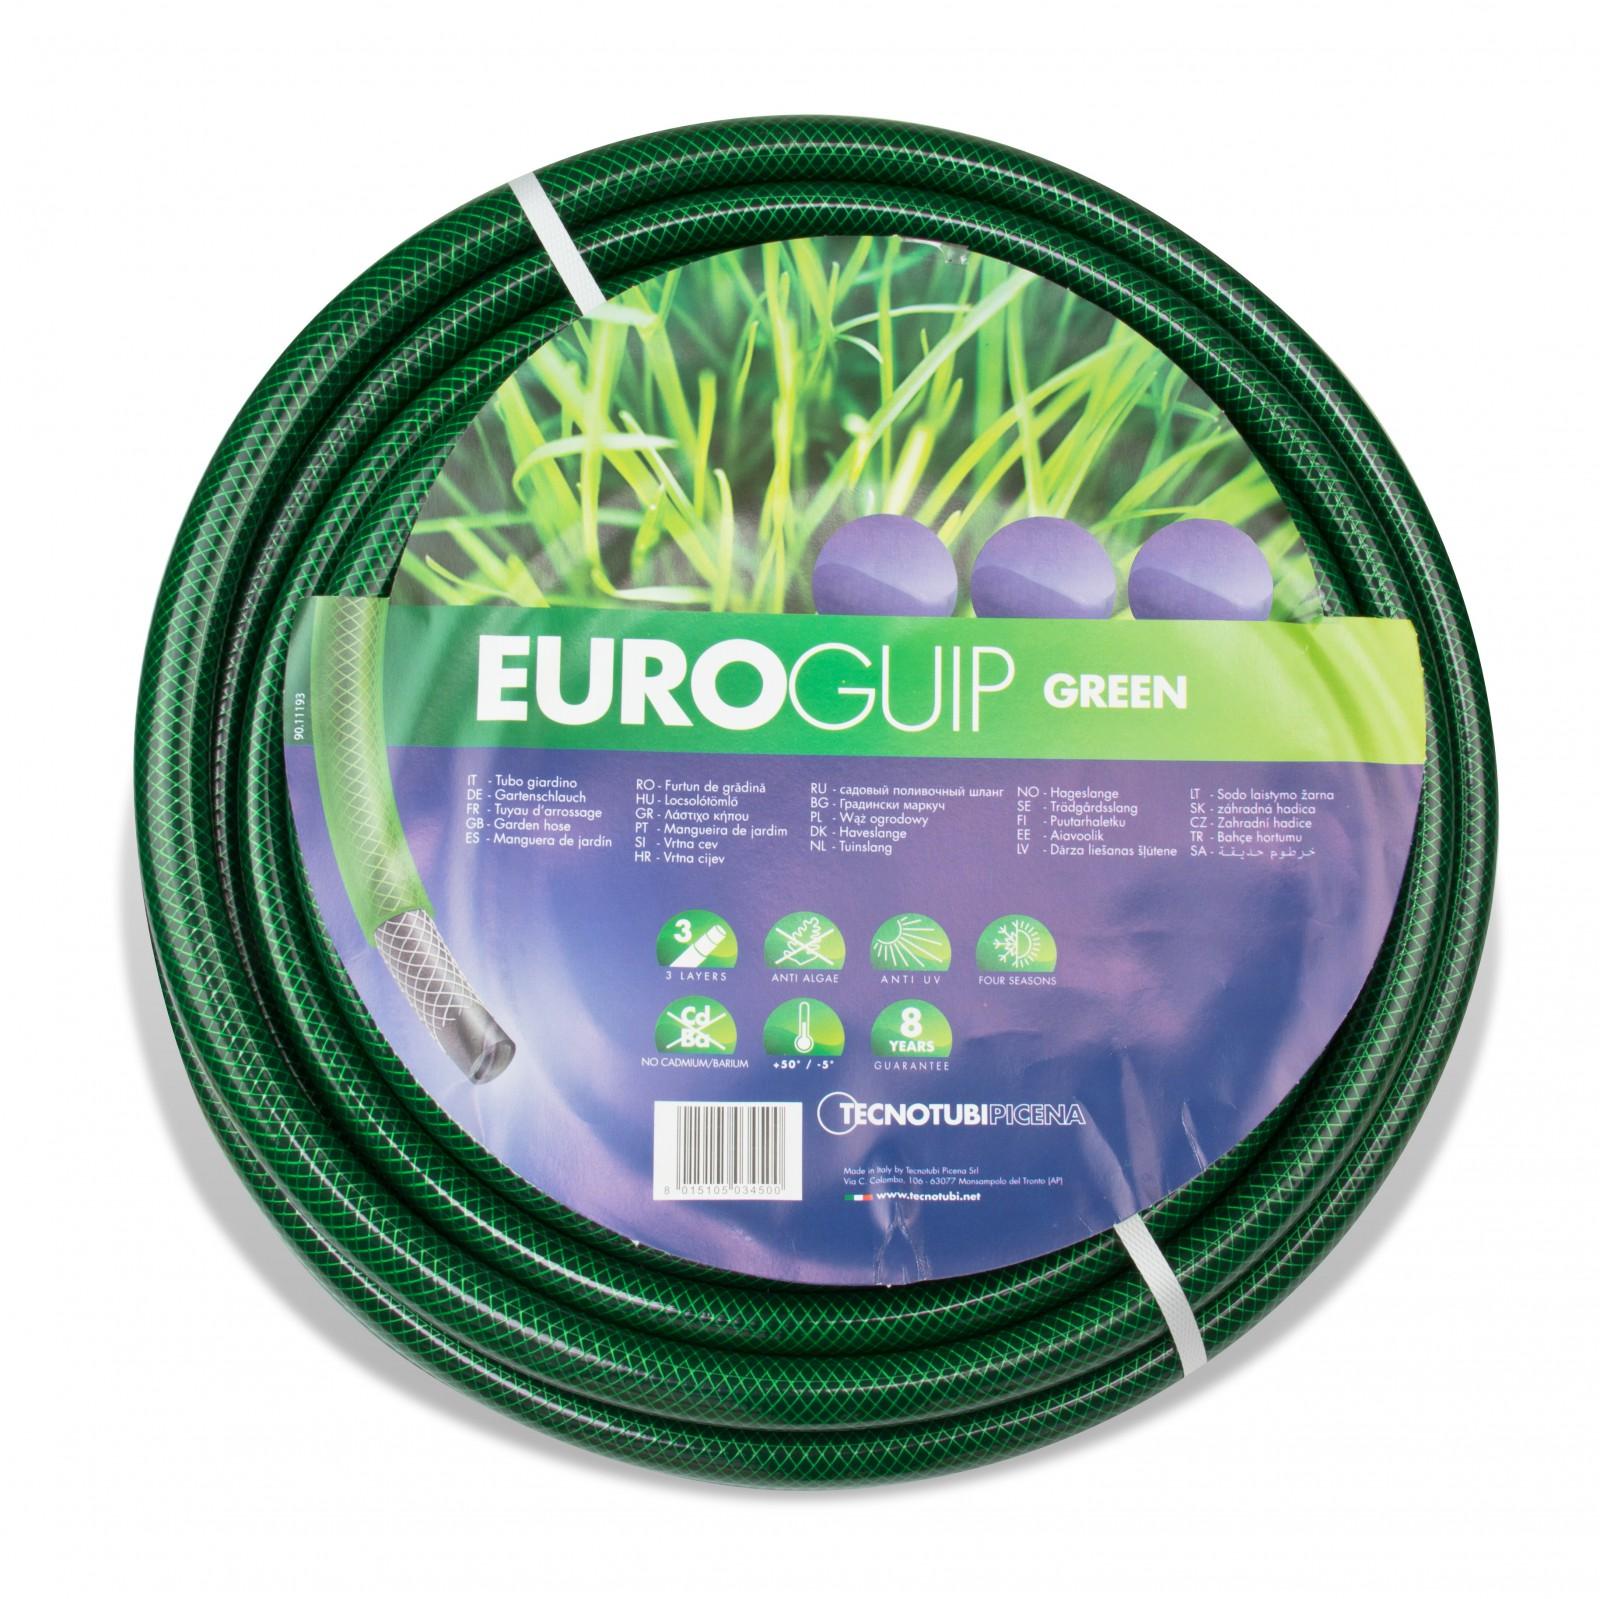 Hervorragend Gartenschlauch 13mm 1/2 Zoll 50m grün Wasserschlauch PVC Schlauch TS16